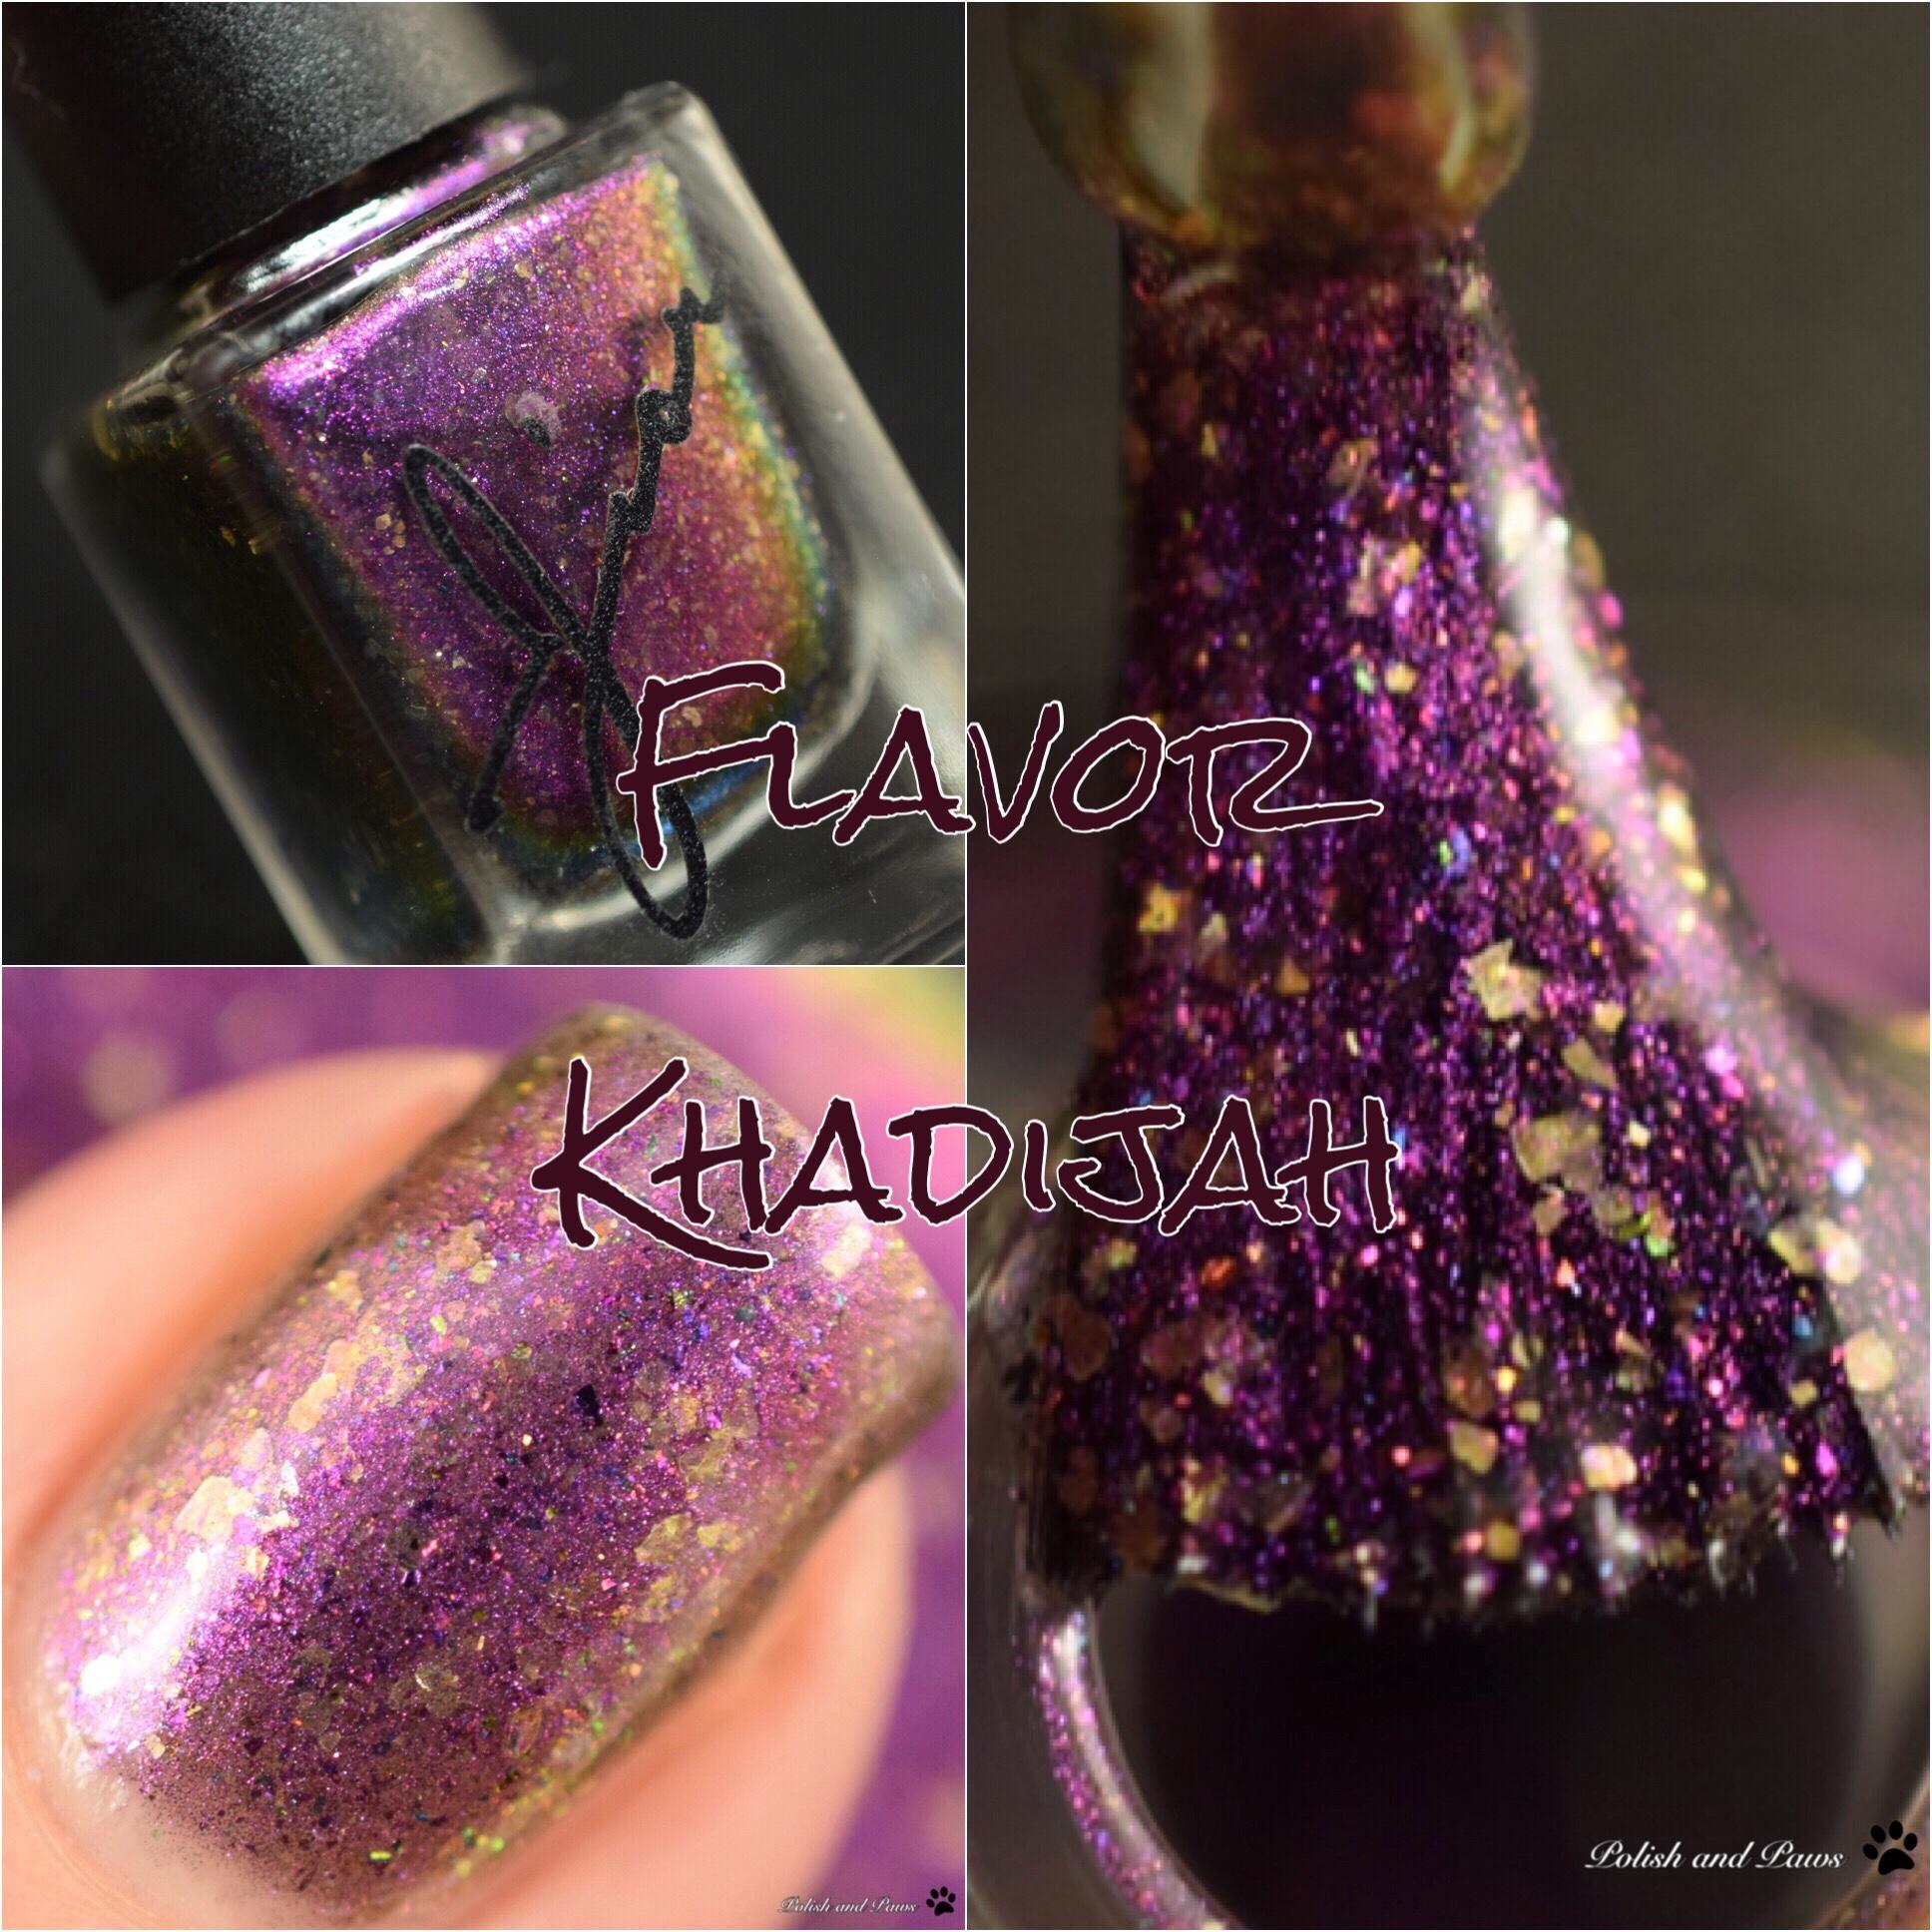 Jior Couture Flavor ~ Khadijah